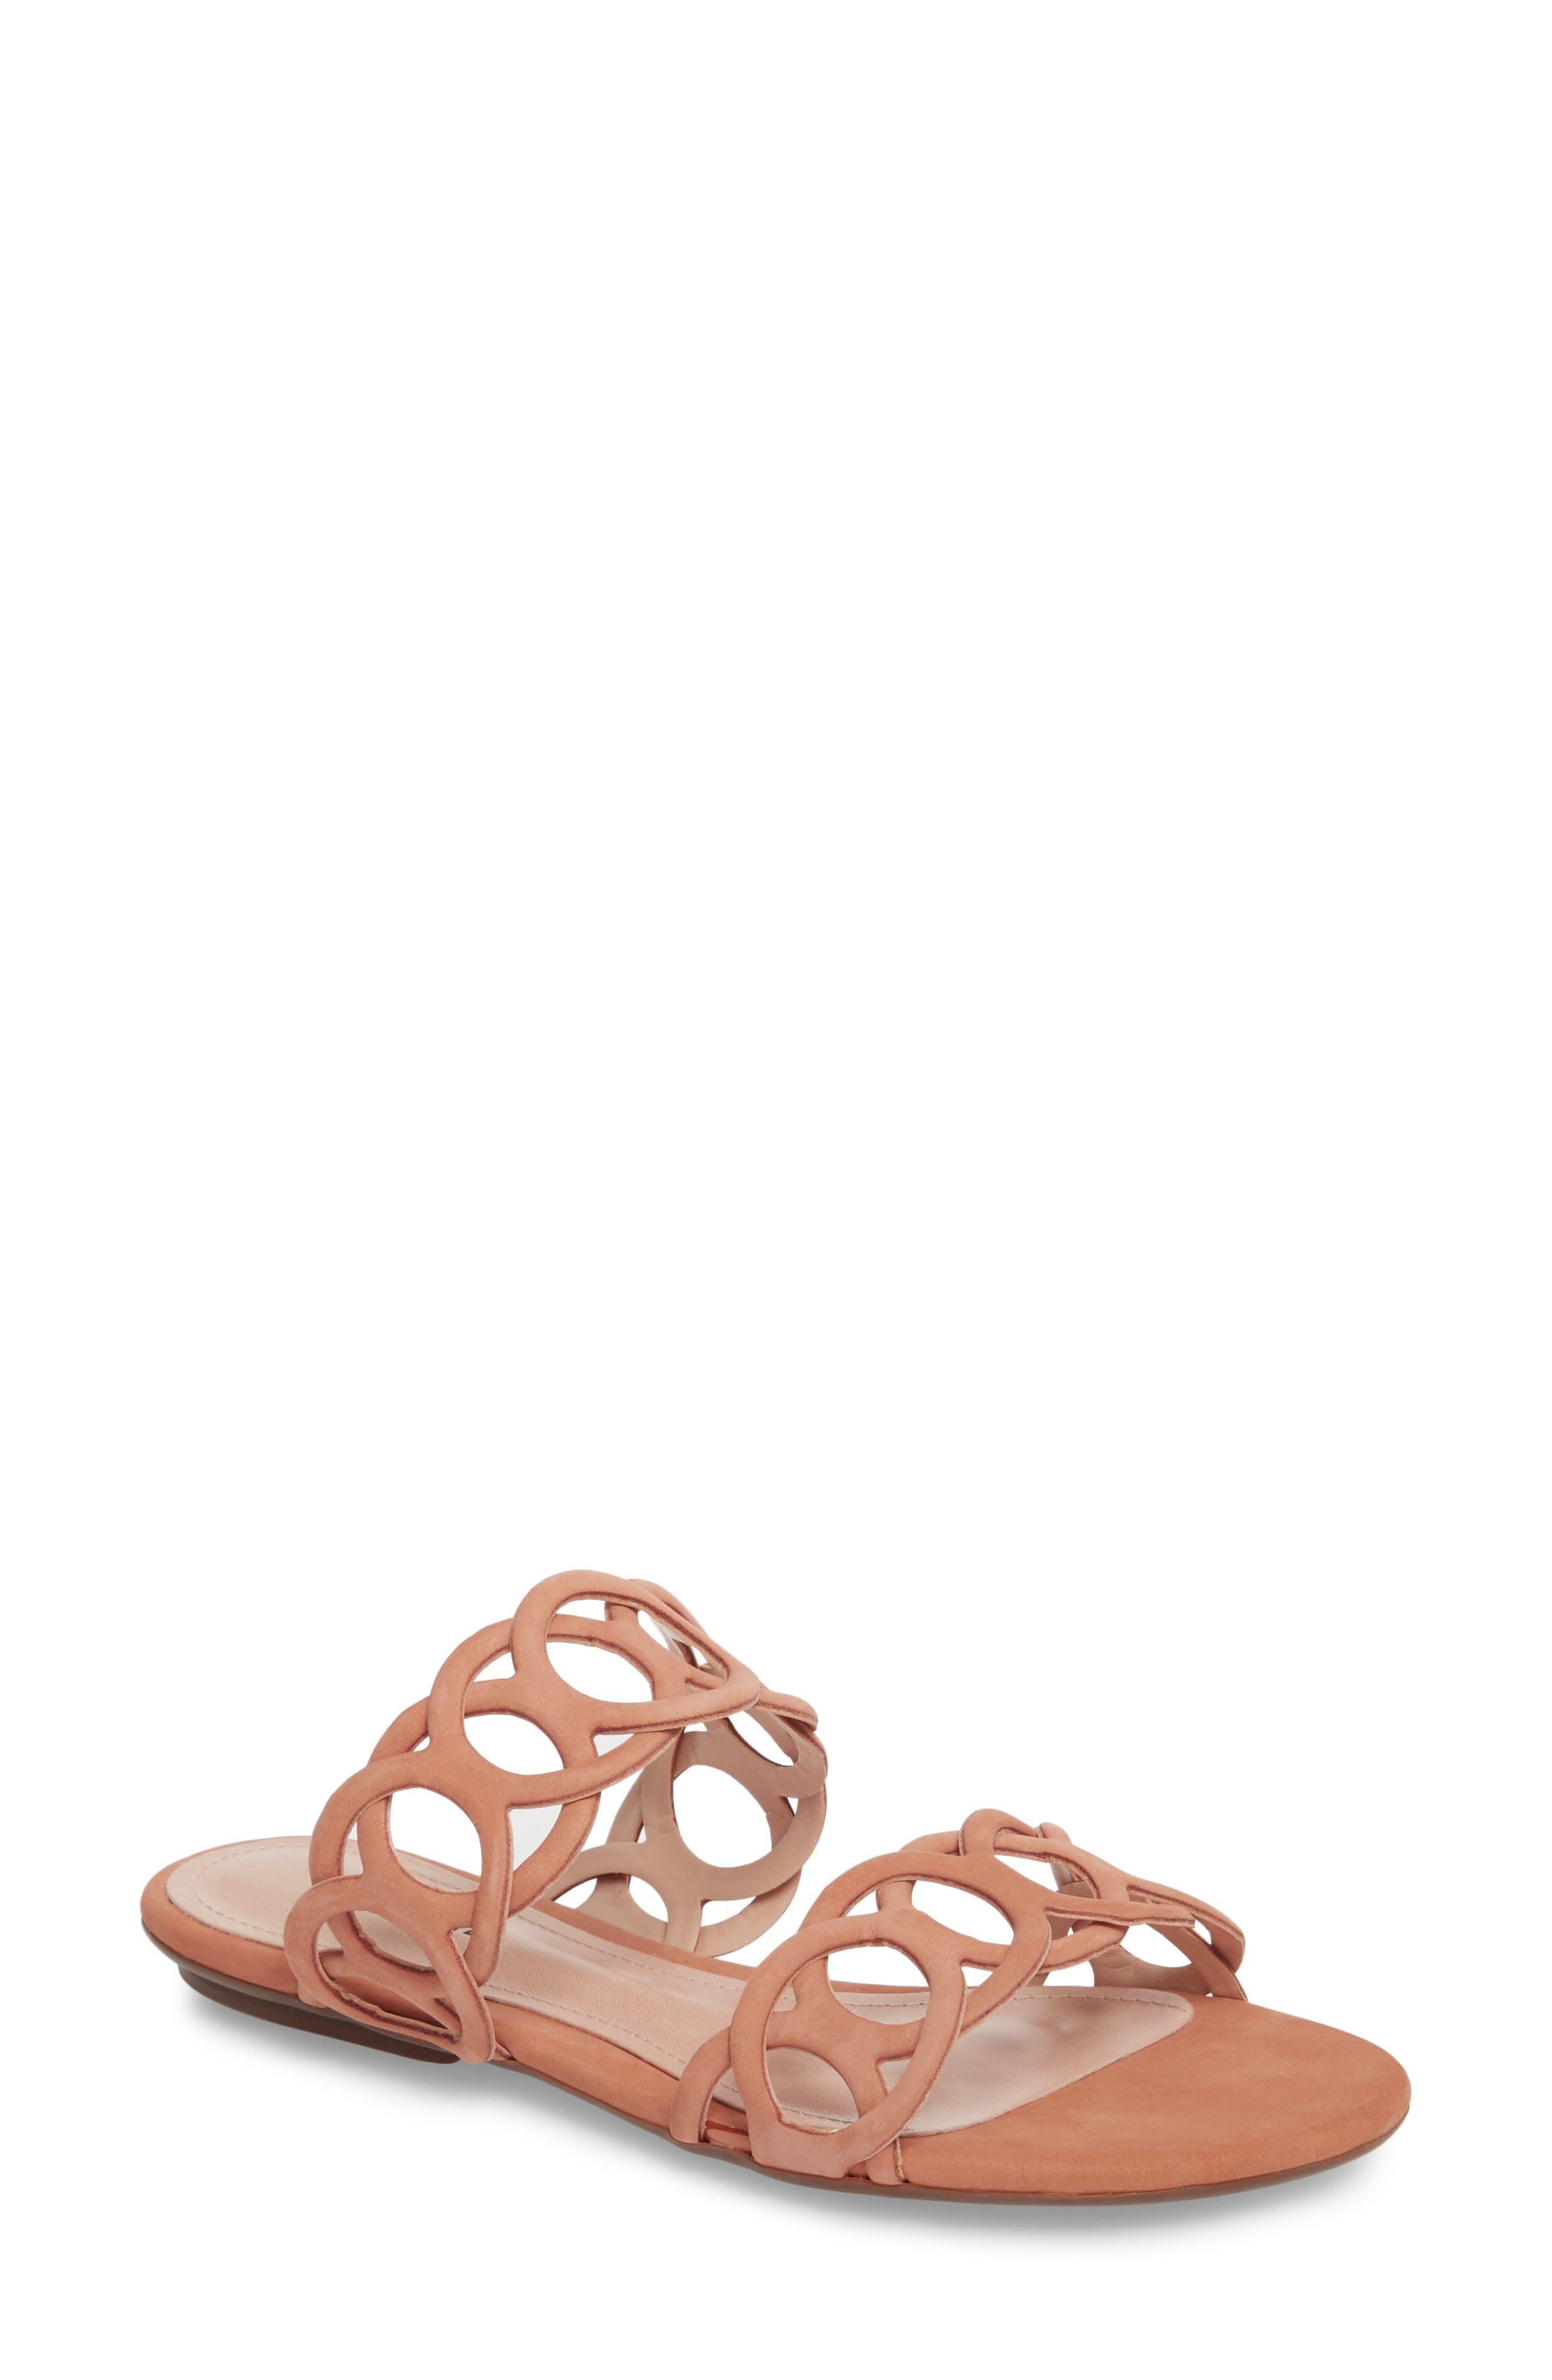 Yaslin Slide Sandal,                             Main thumbnail 1, color,                             Toasted Nut Leather